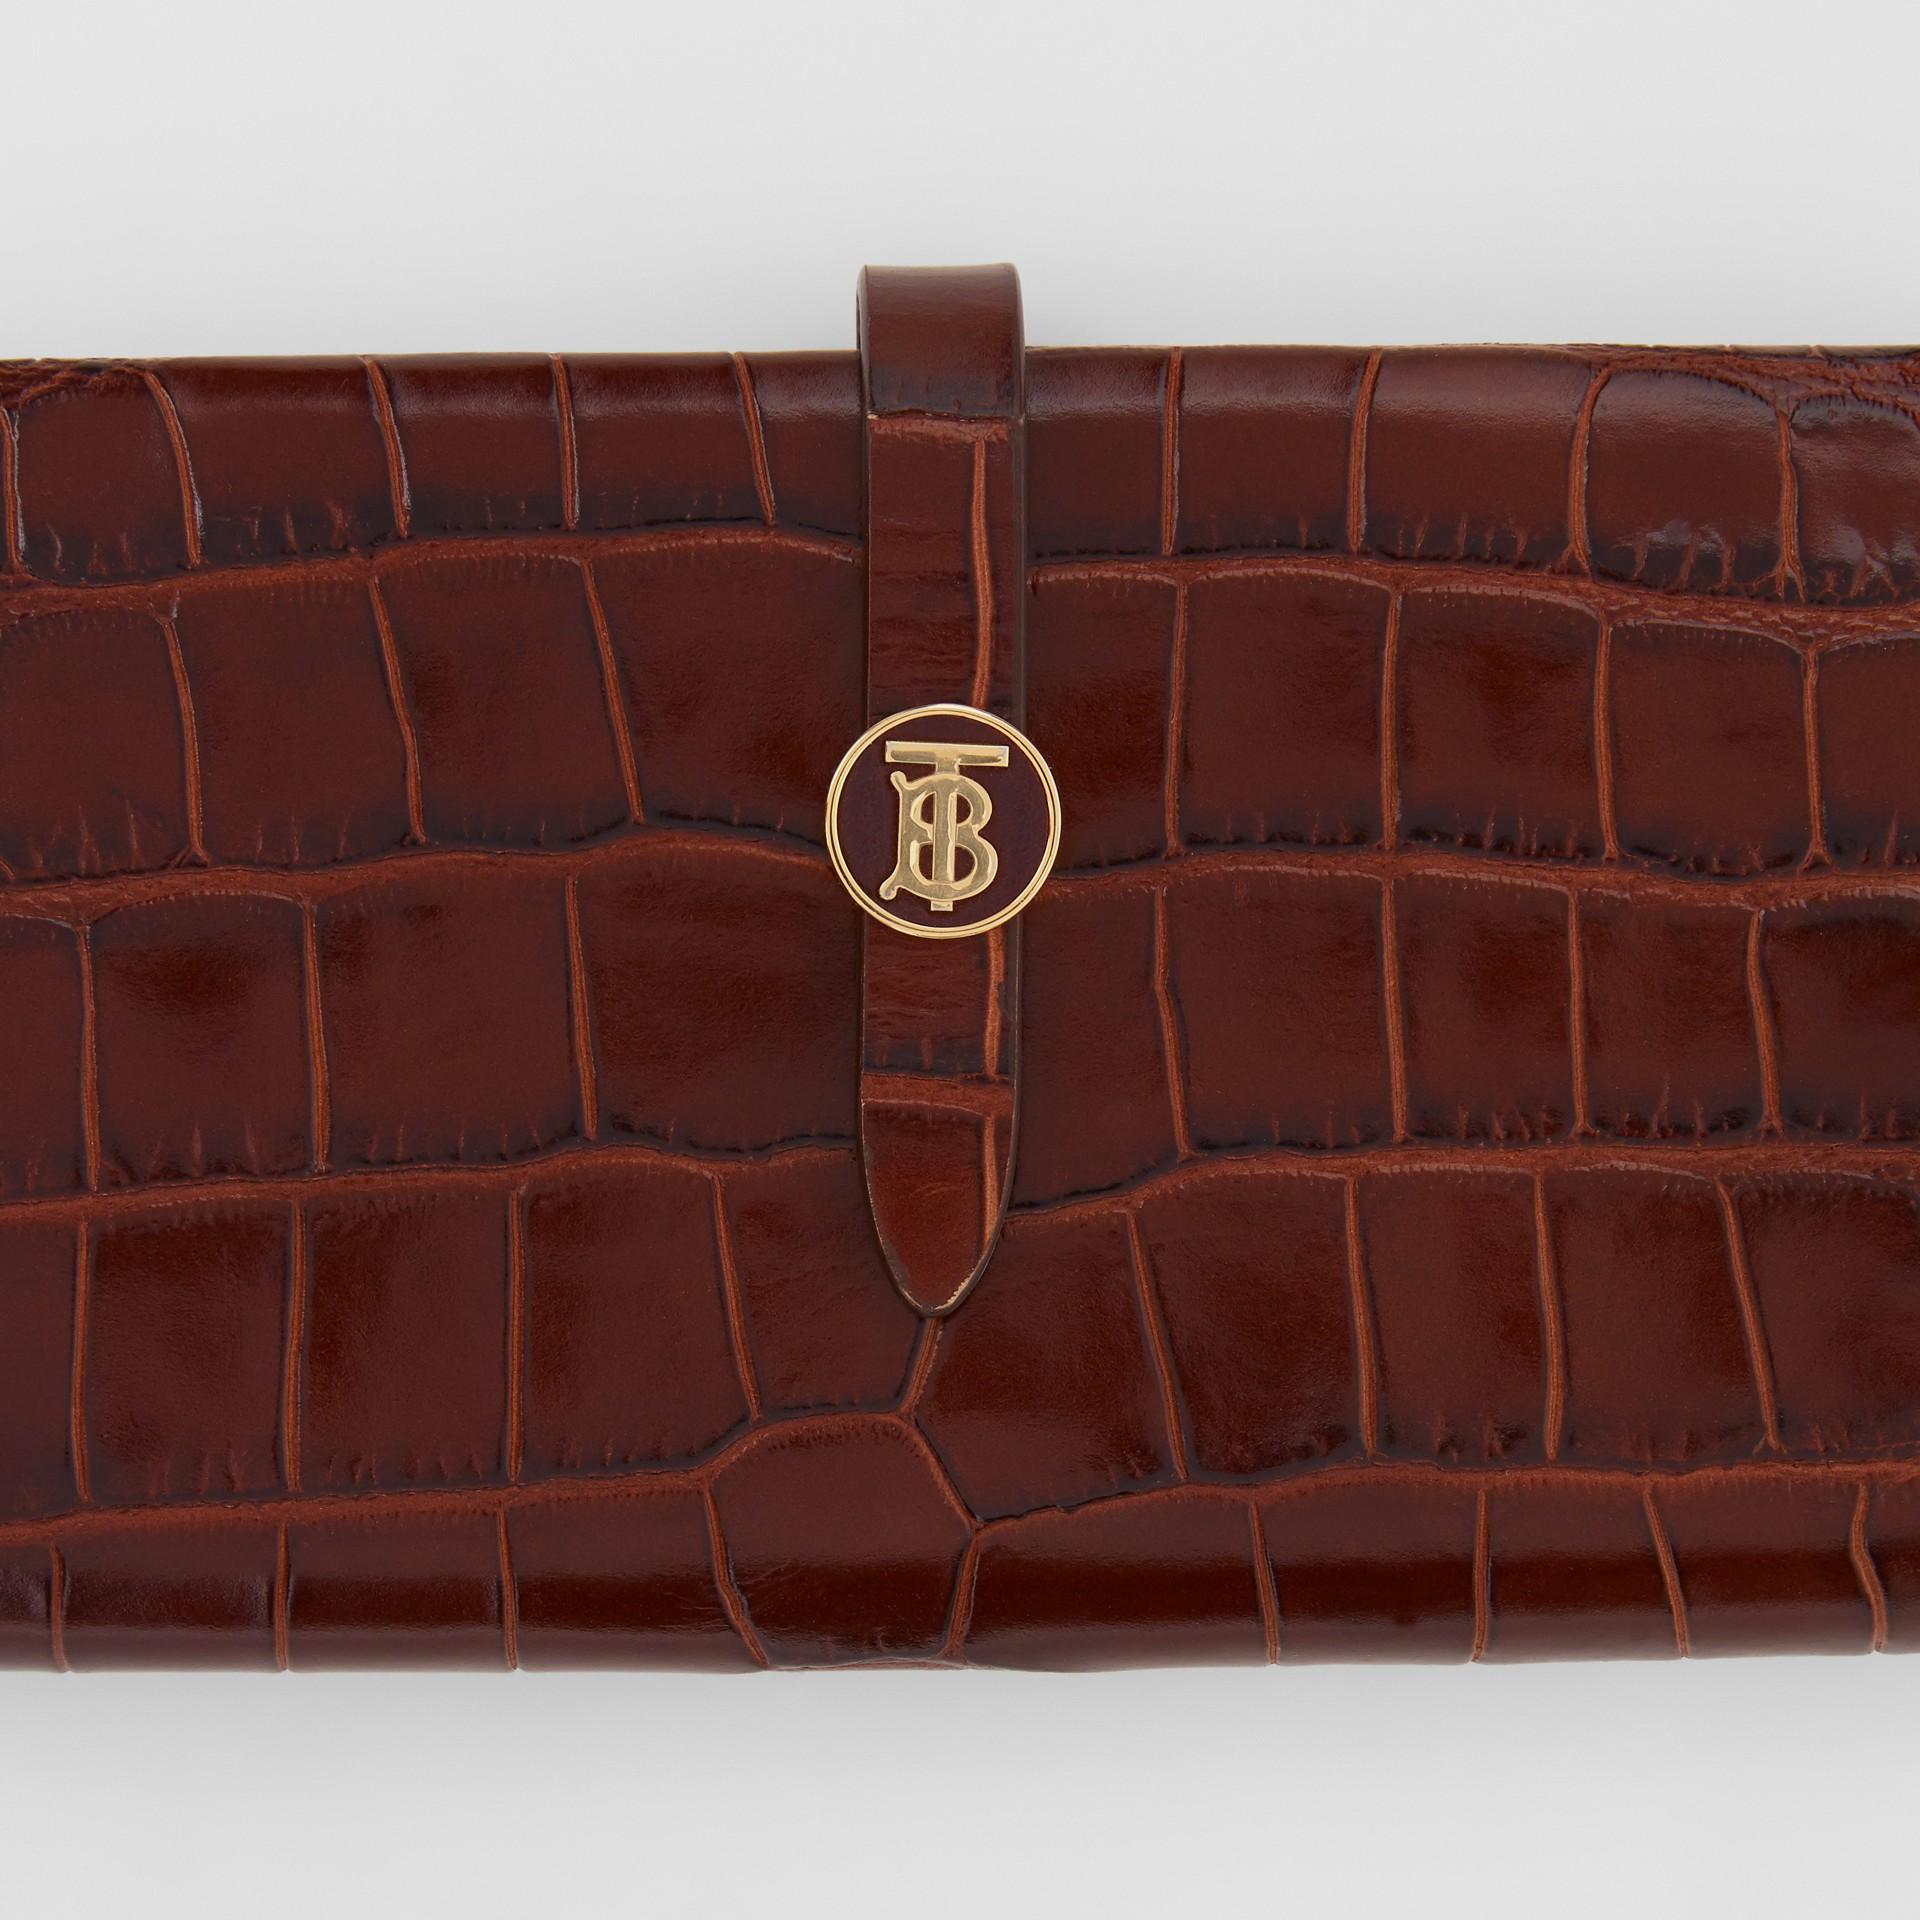 Monogram Motif Embossed Leather Folding Wallet in Tan - Women | Burberry - gallery image 7